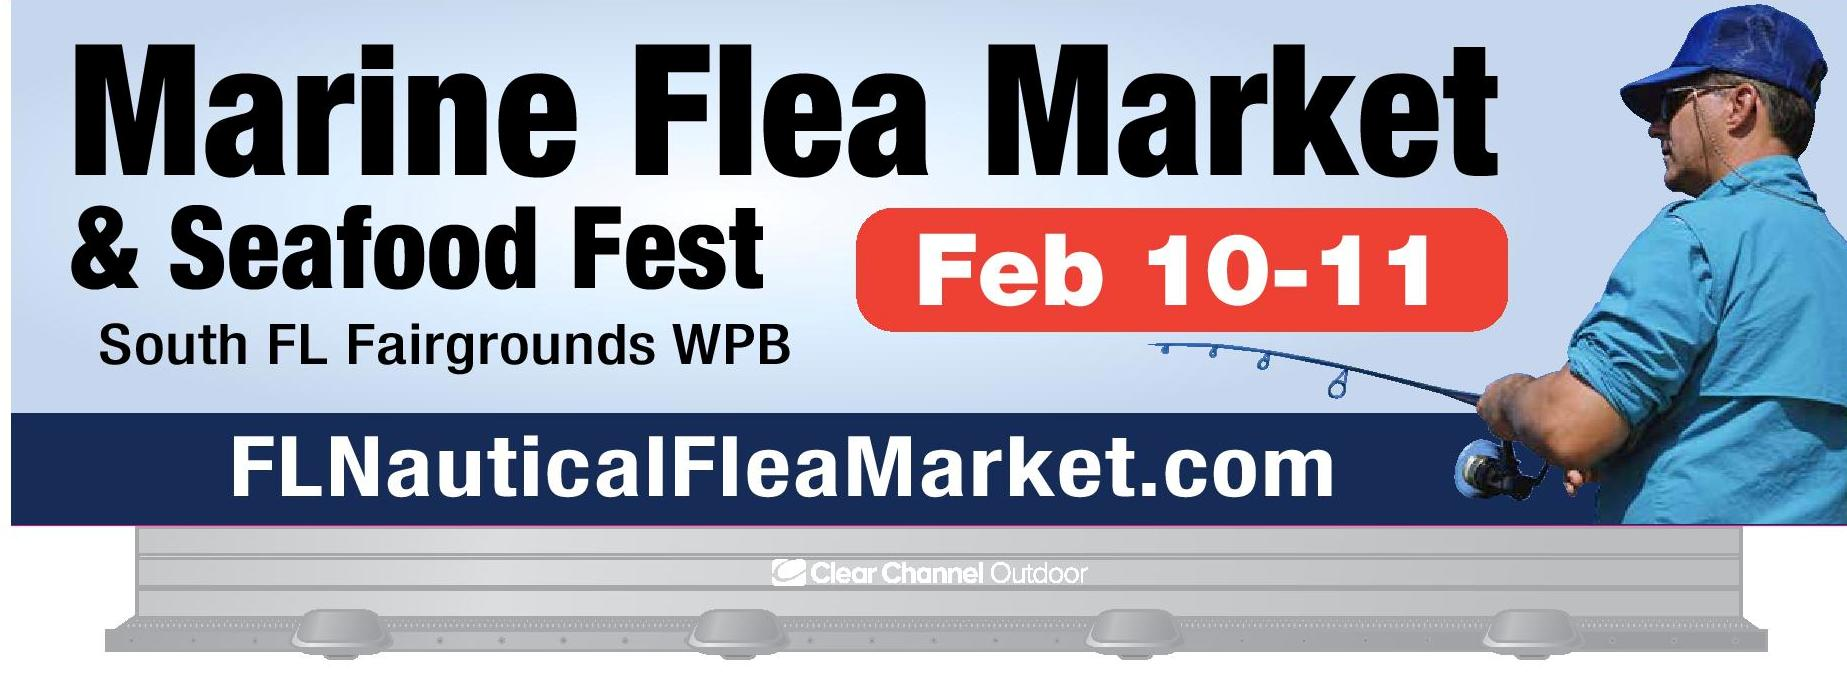 Marine flea market boat sale and seafood festival for Fishing flea market near me